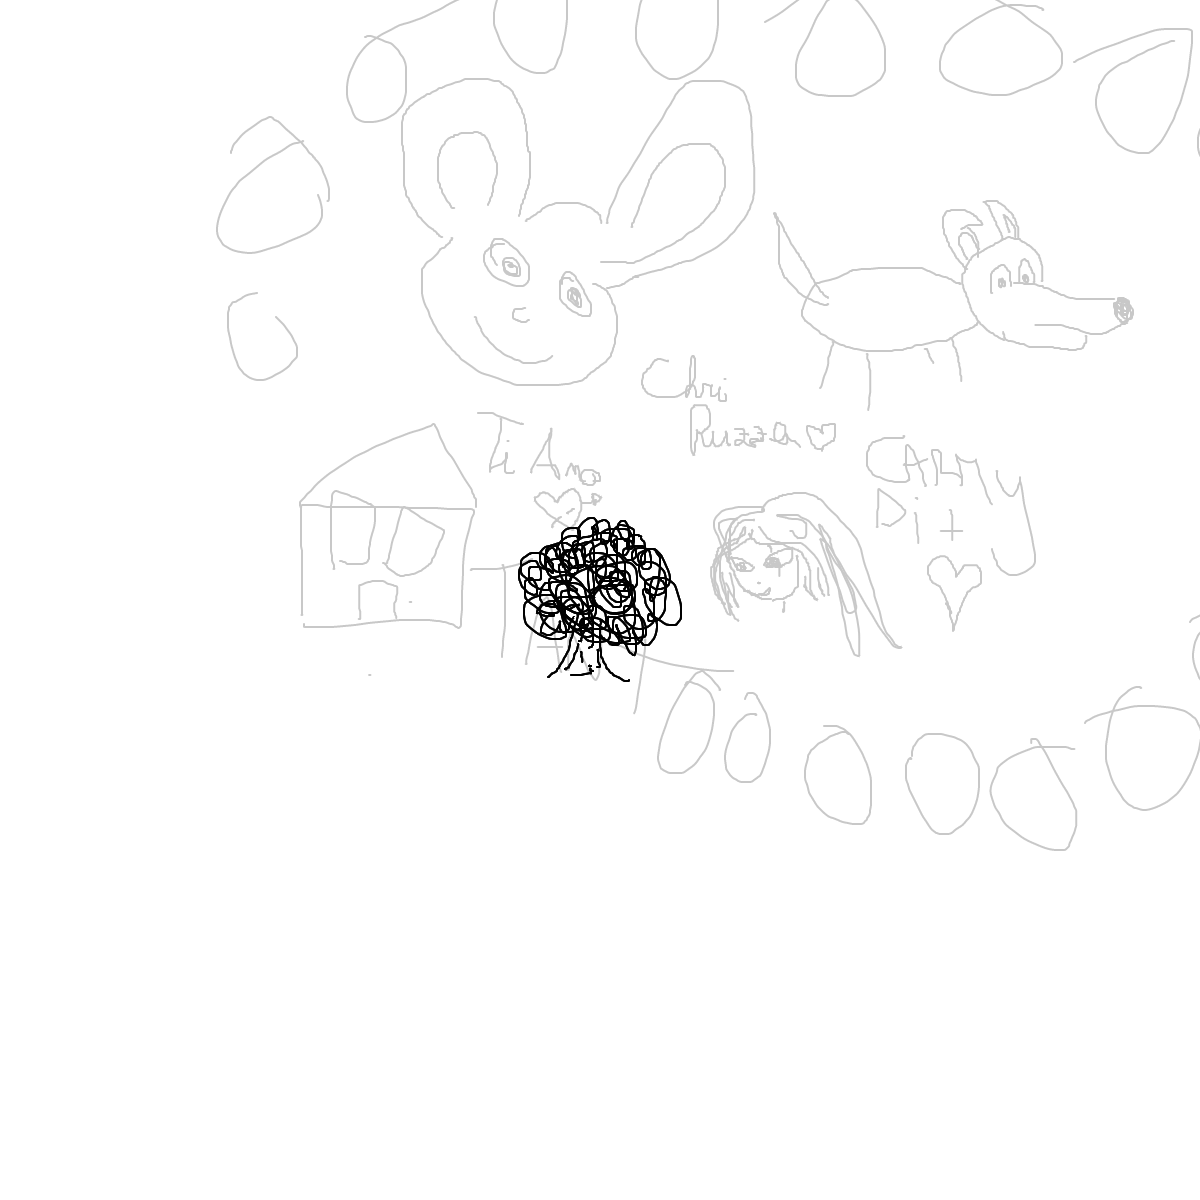 BAAAM drawing#22896 lat:44.9449653625488300lng: 8.4873819351196290